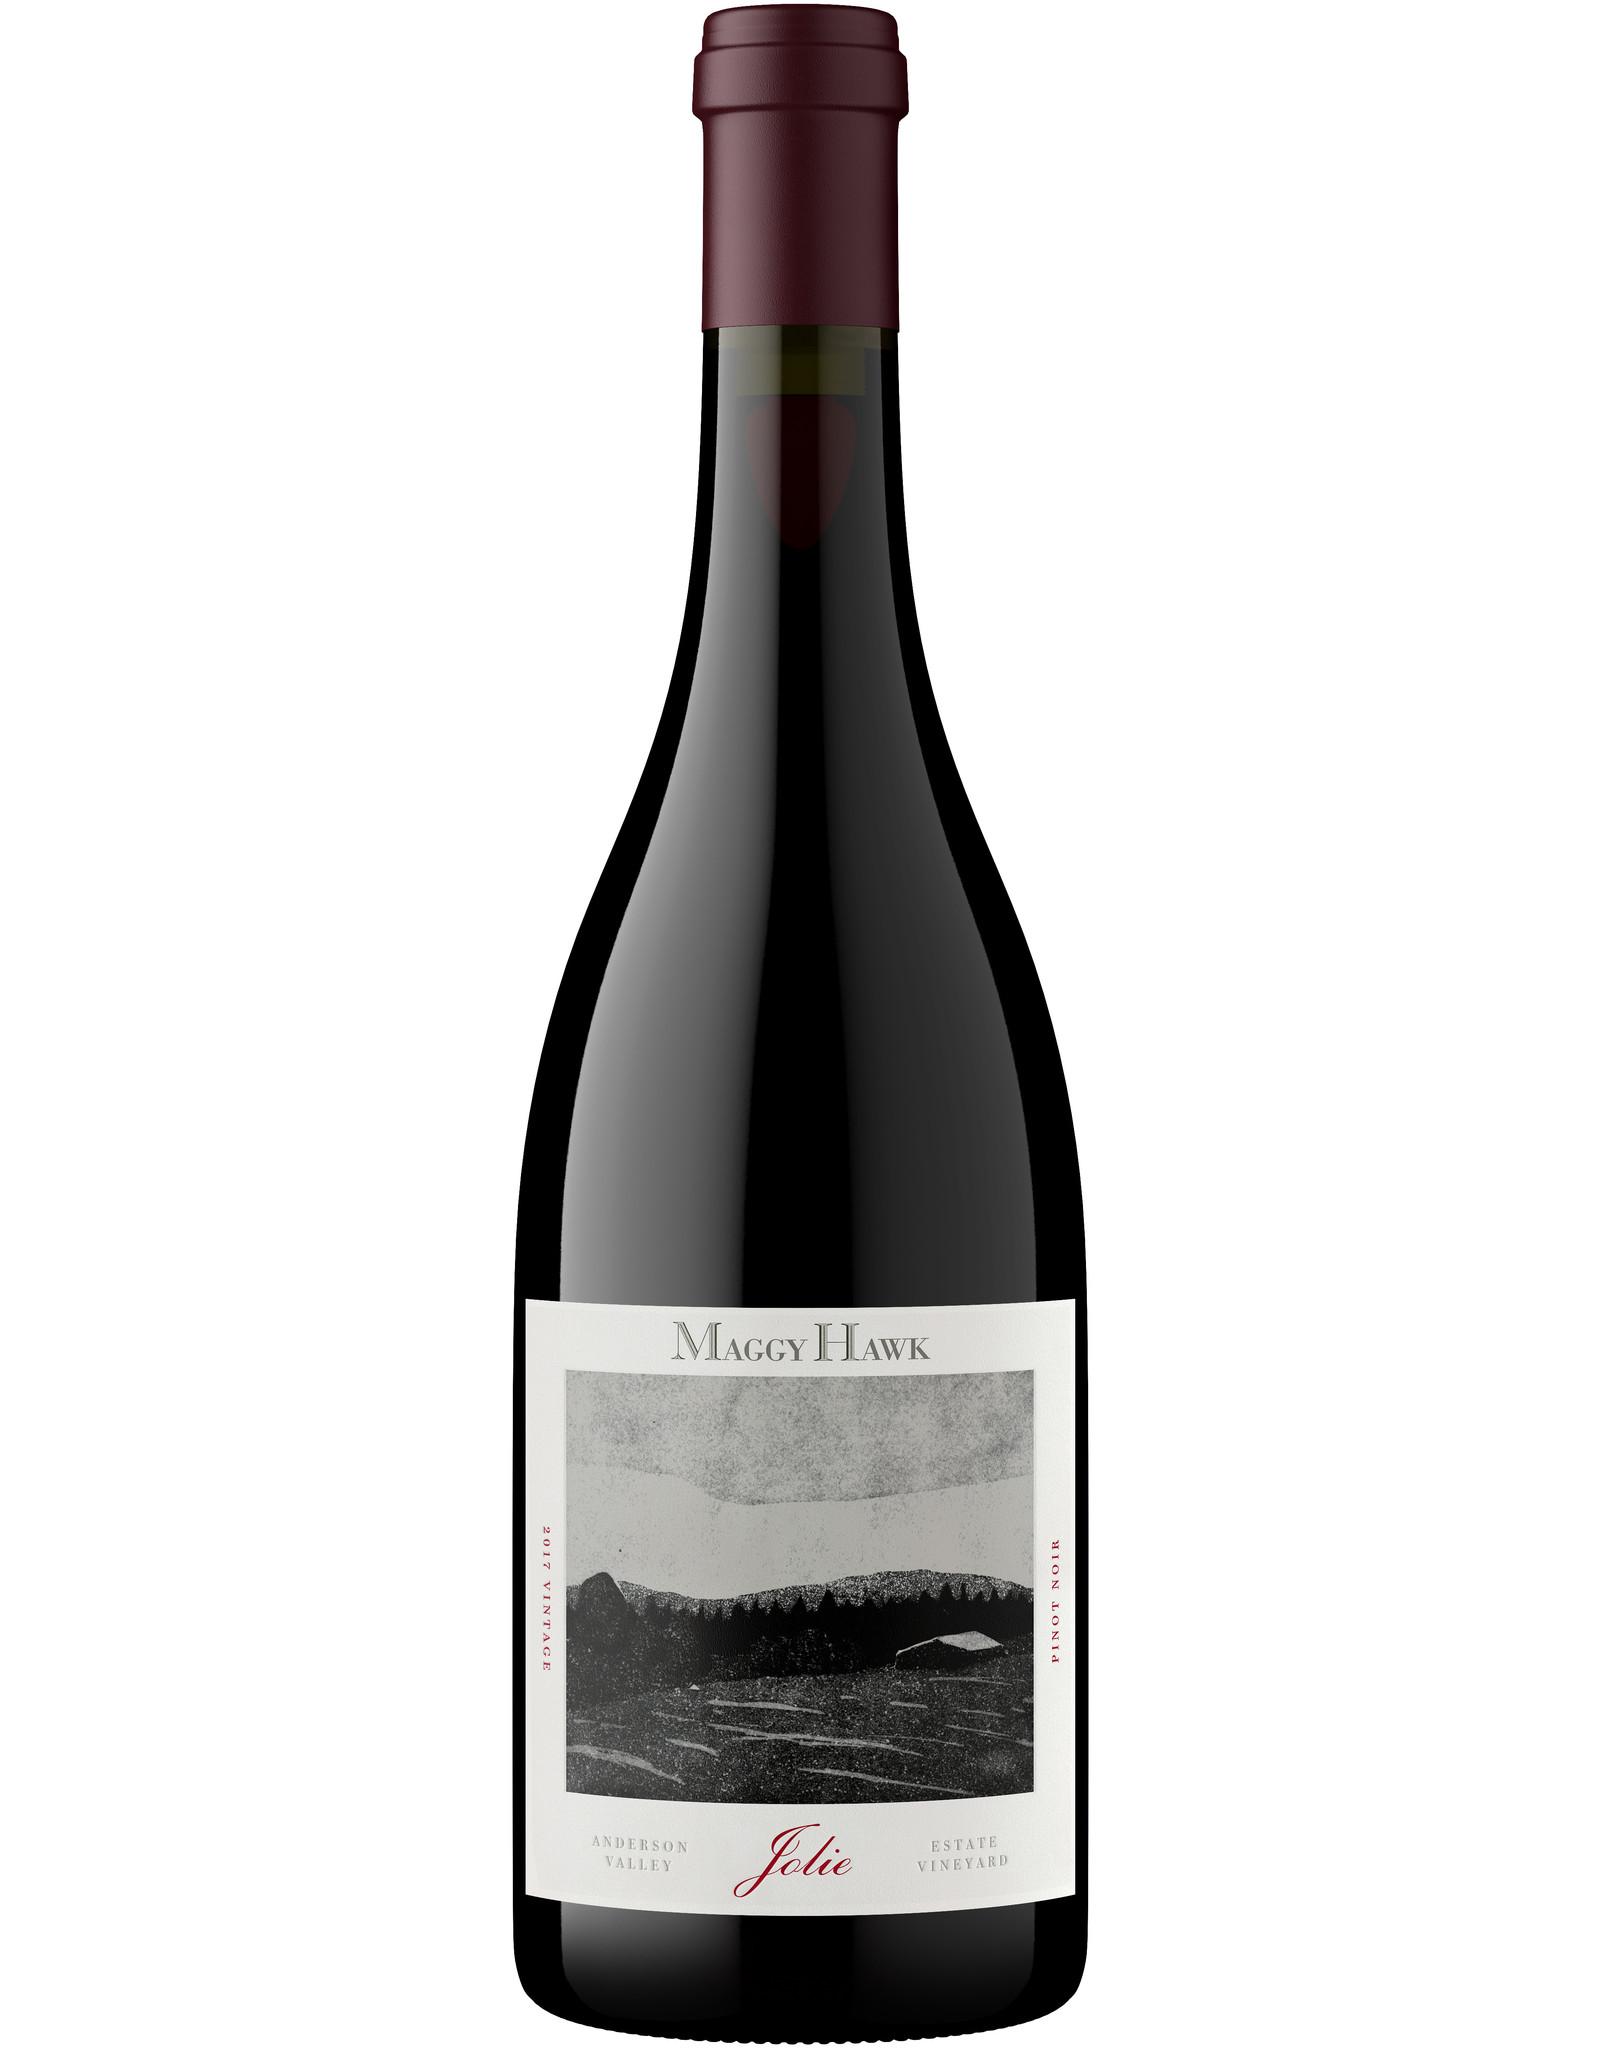 Maggy Hawk Jolie Pinot Noir, Anderson Valley 2017